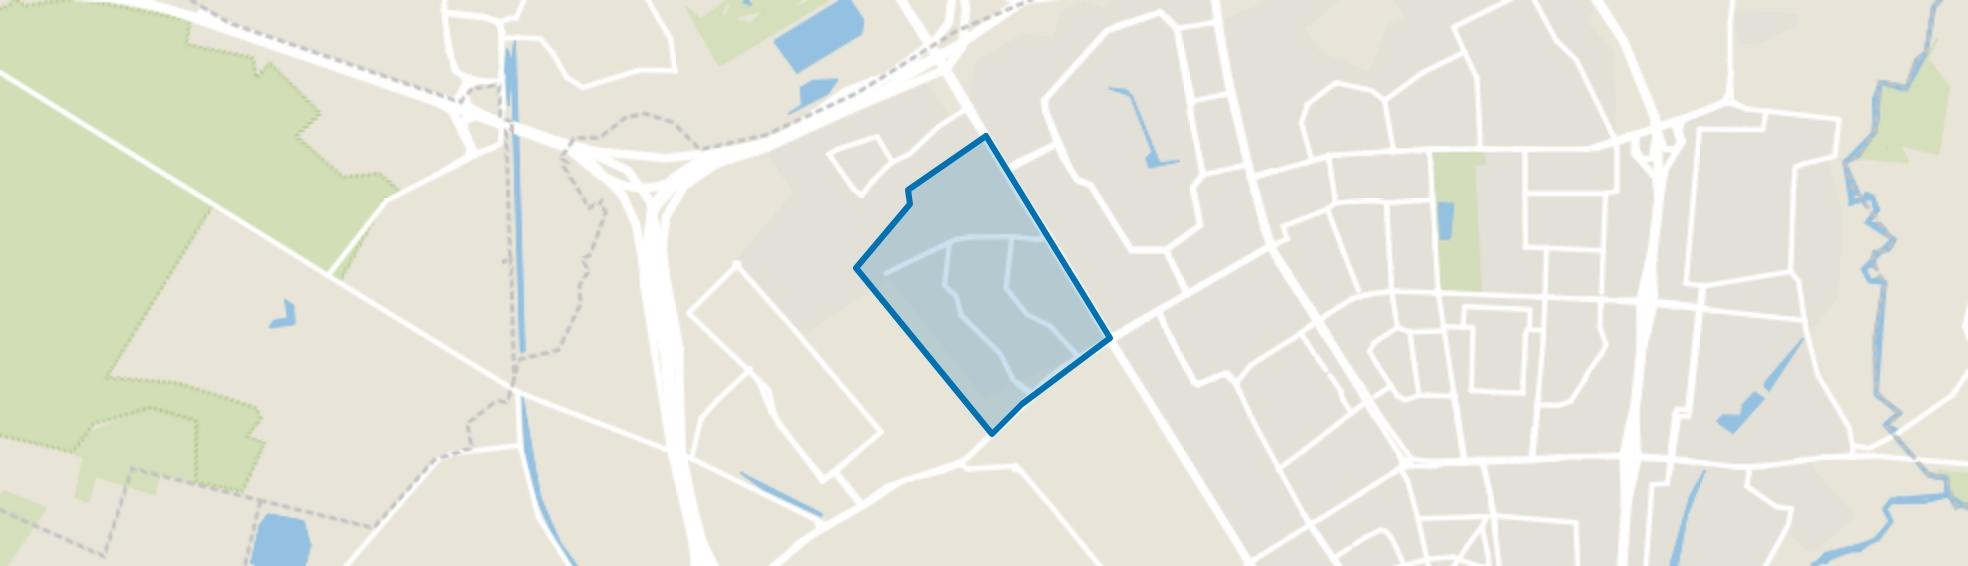 Kerkdorp Acht, Eindhoven map